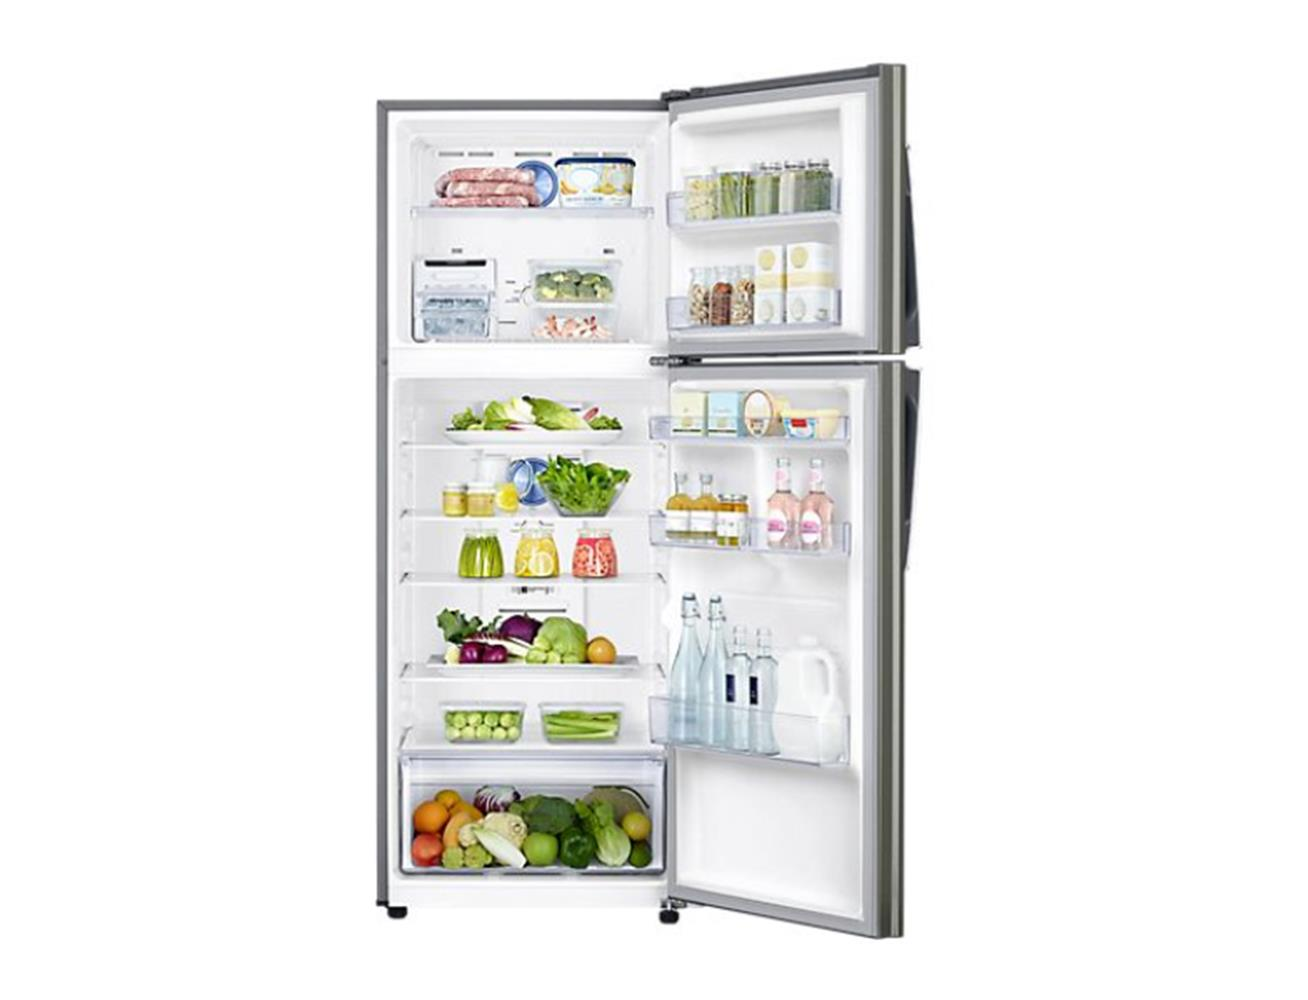 Samsung Refrigerator 500L, Twin Cooling Plus™ - Platinum Inox  Blink